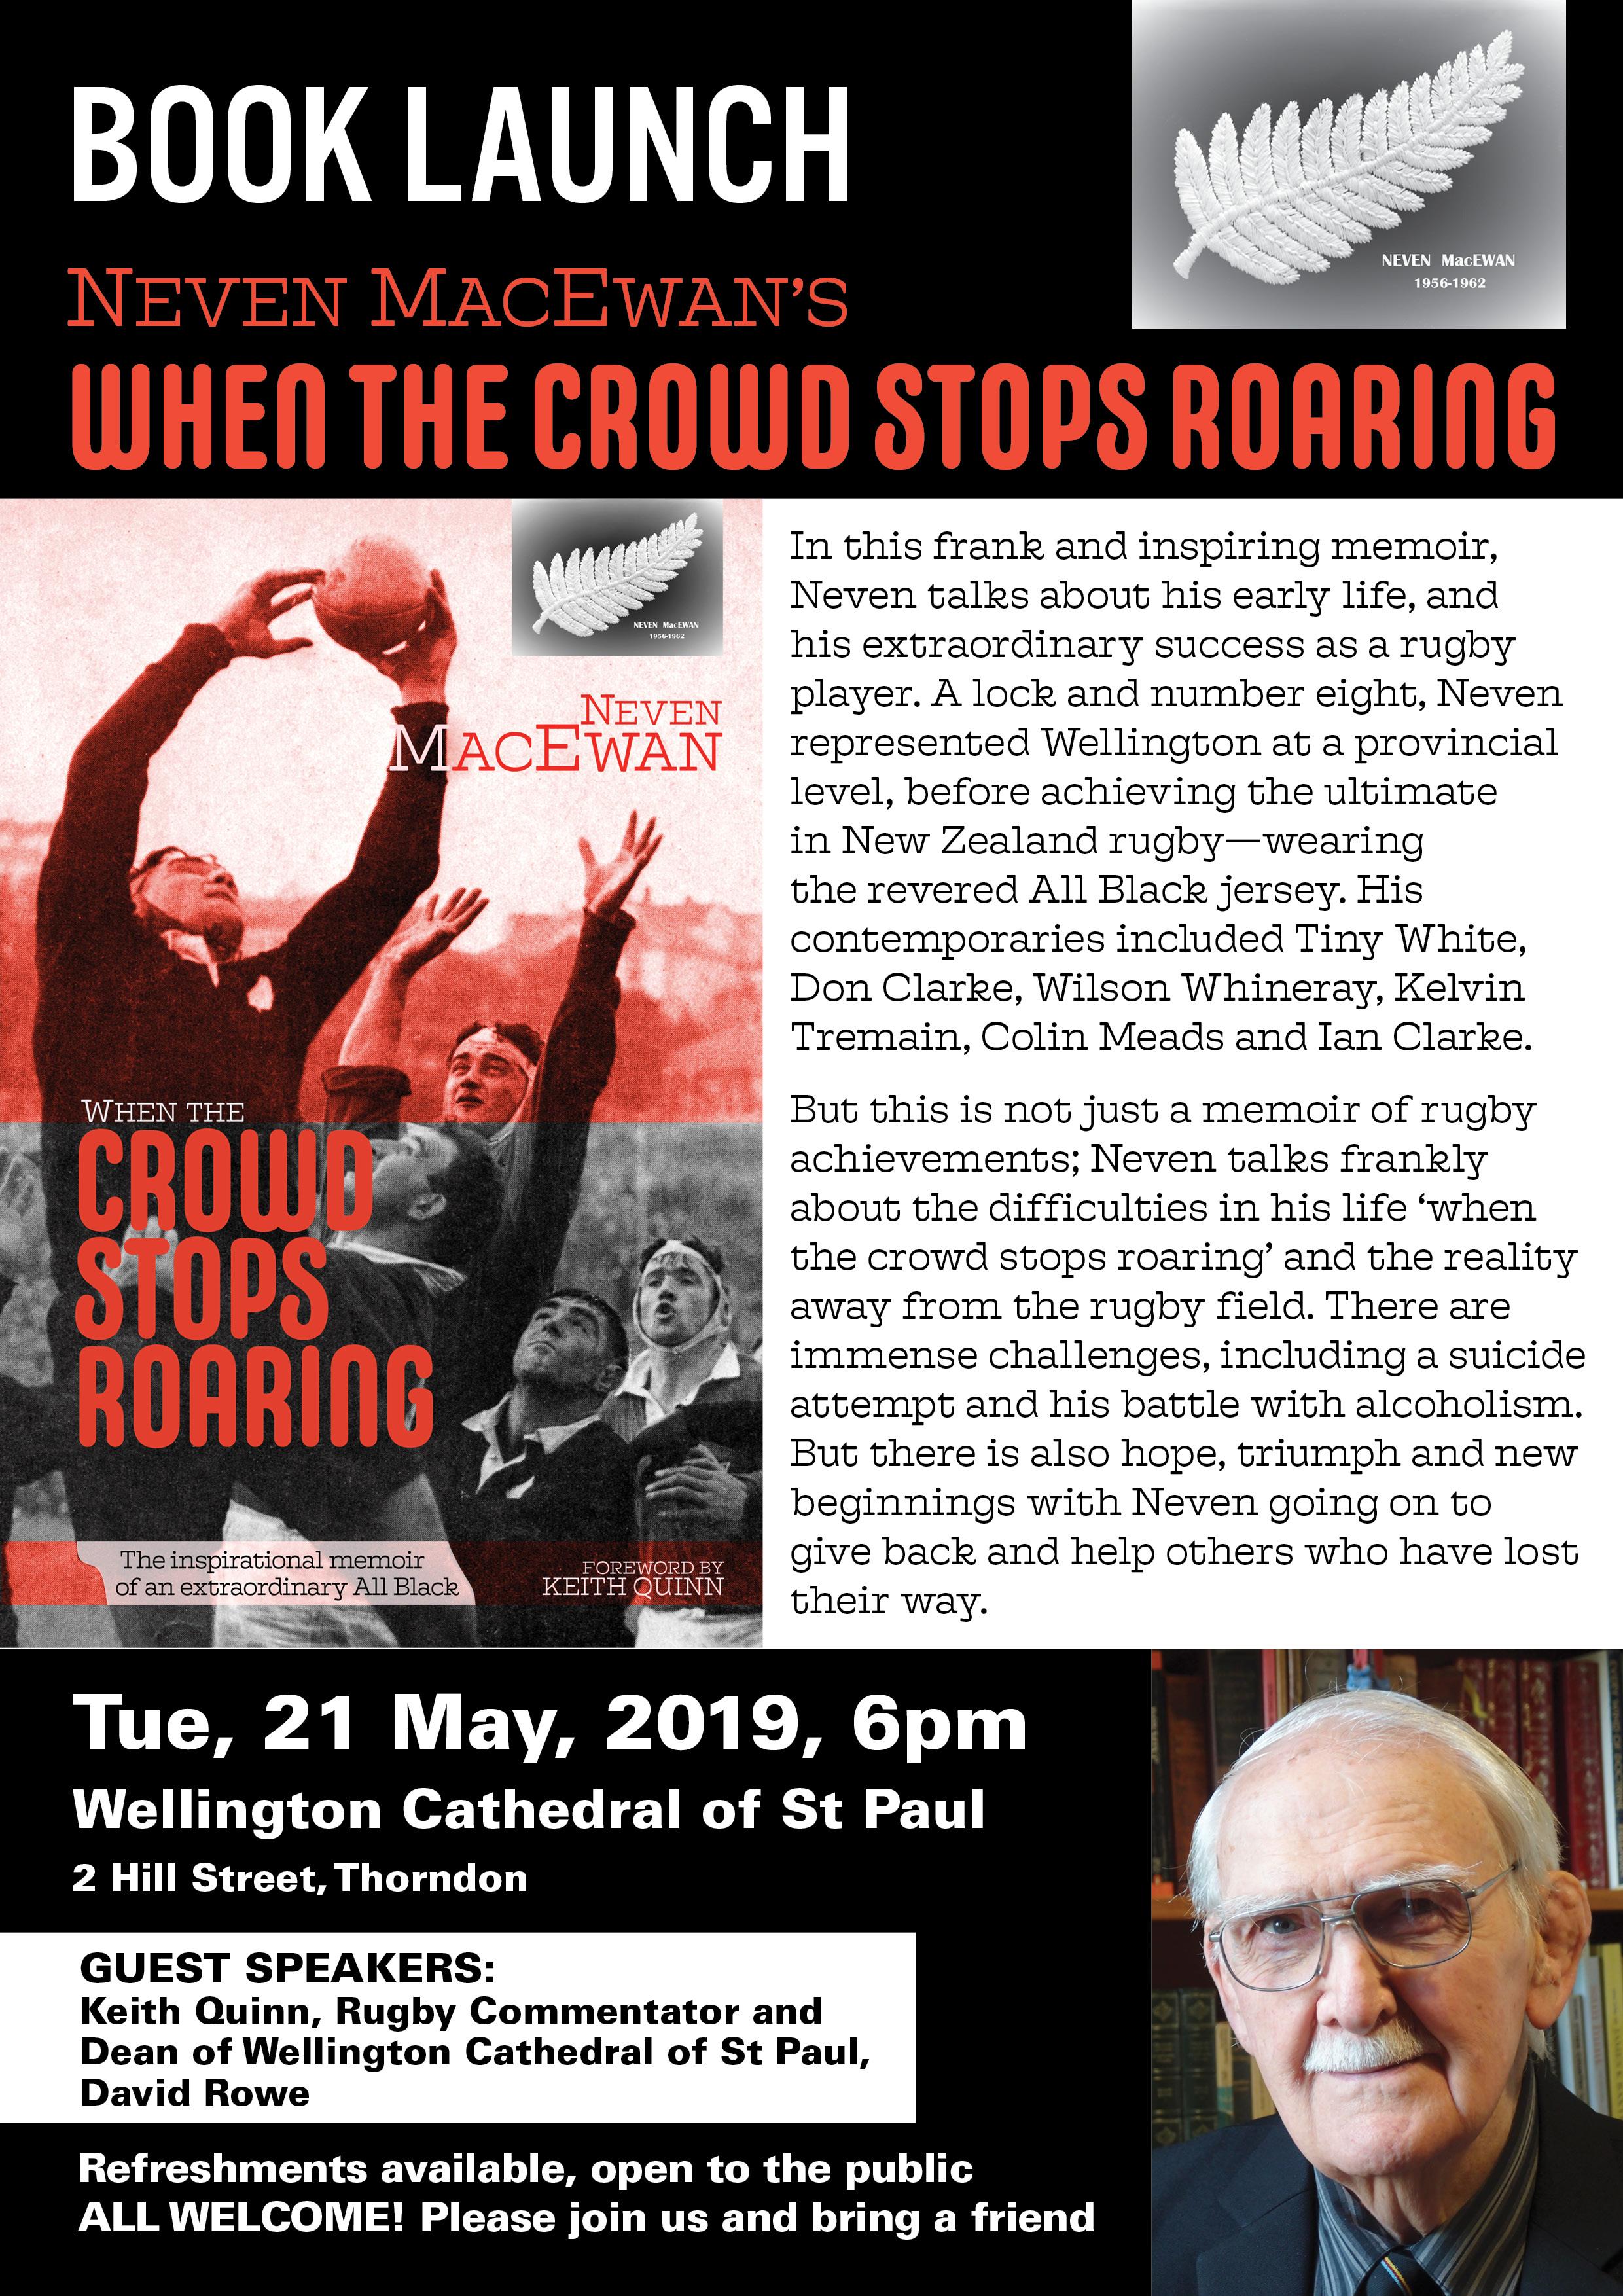 WCSR Wellington book launch poster3.jpg